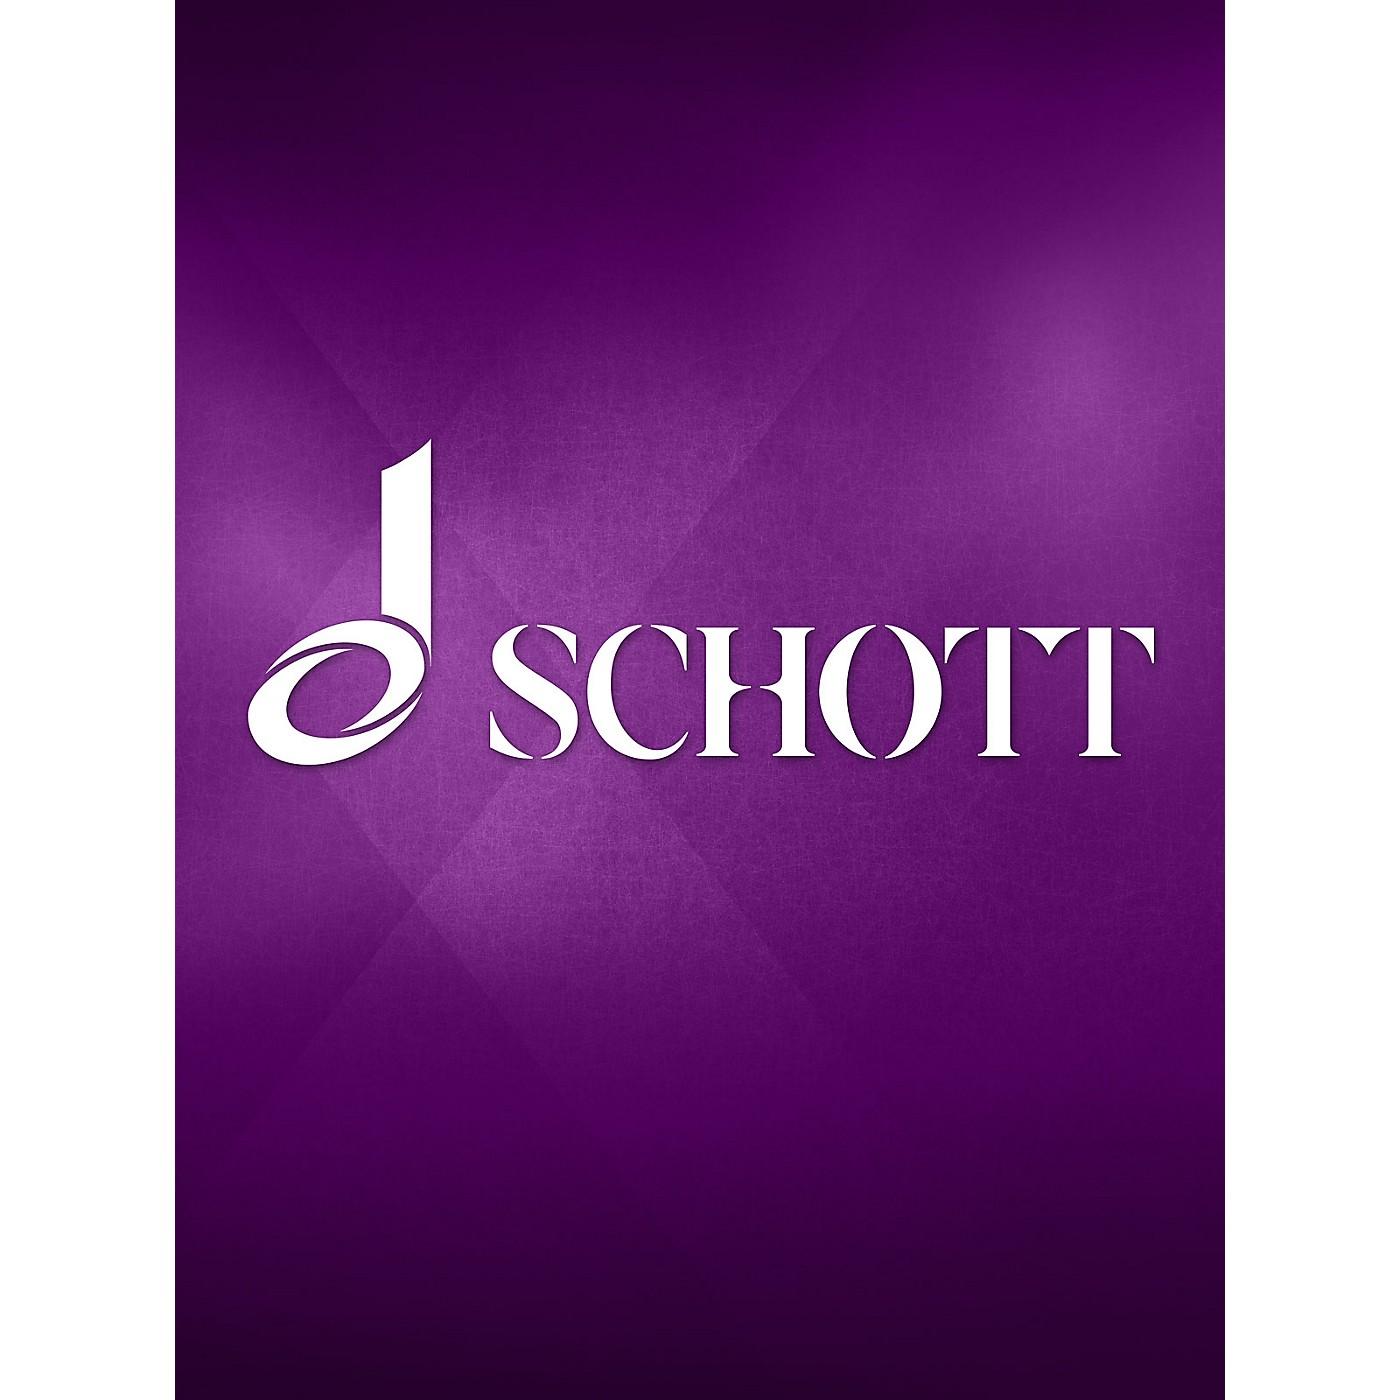 Schott Sinfonia (Chamber Orchestra Study Score) Schott Series Composed by Peter Maxwell-Davies thumbnail